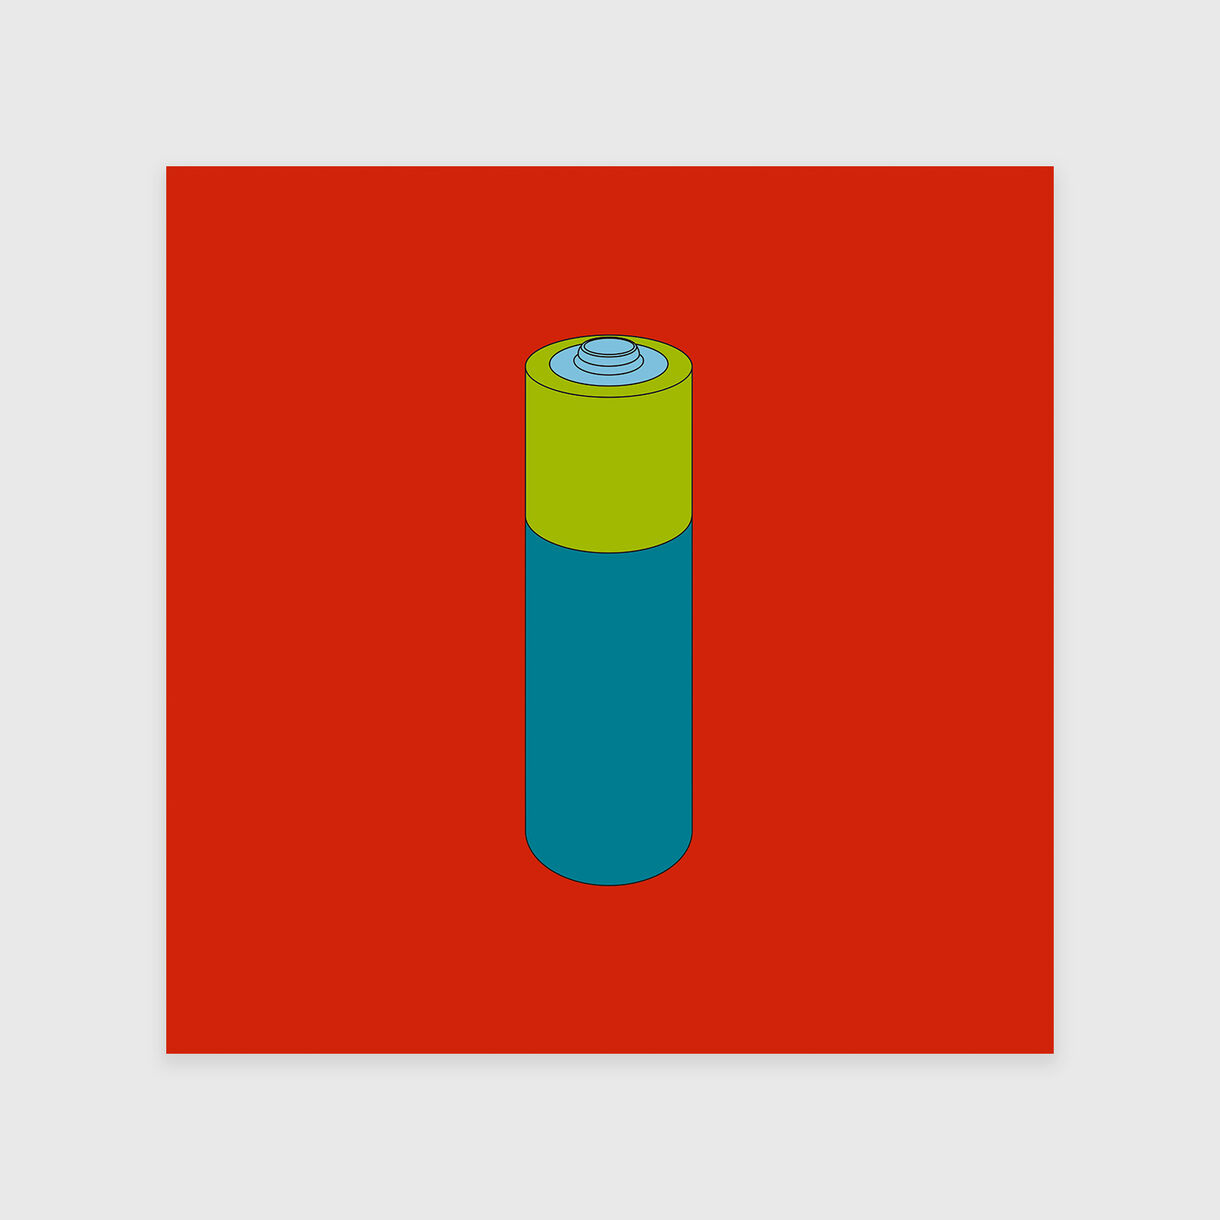 Long-life Battery, Michael Craig-Martin